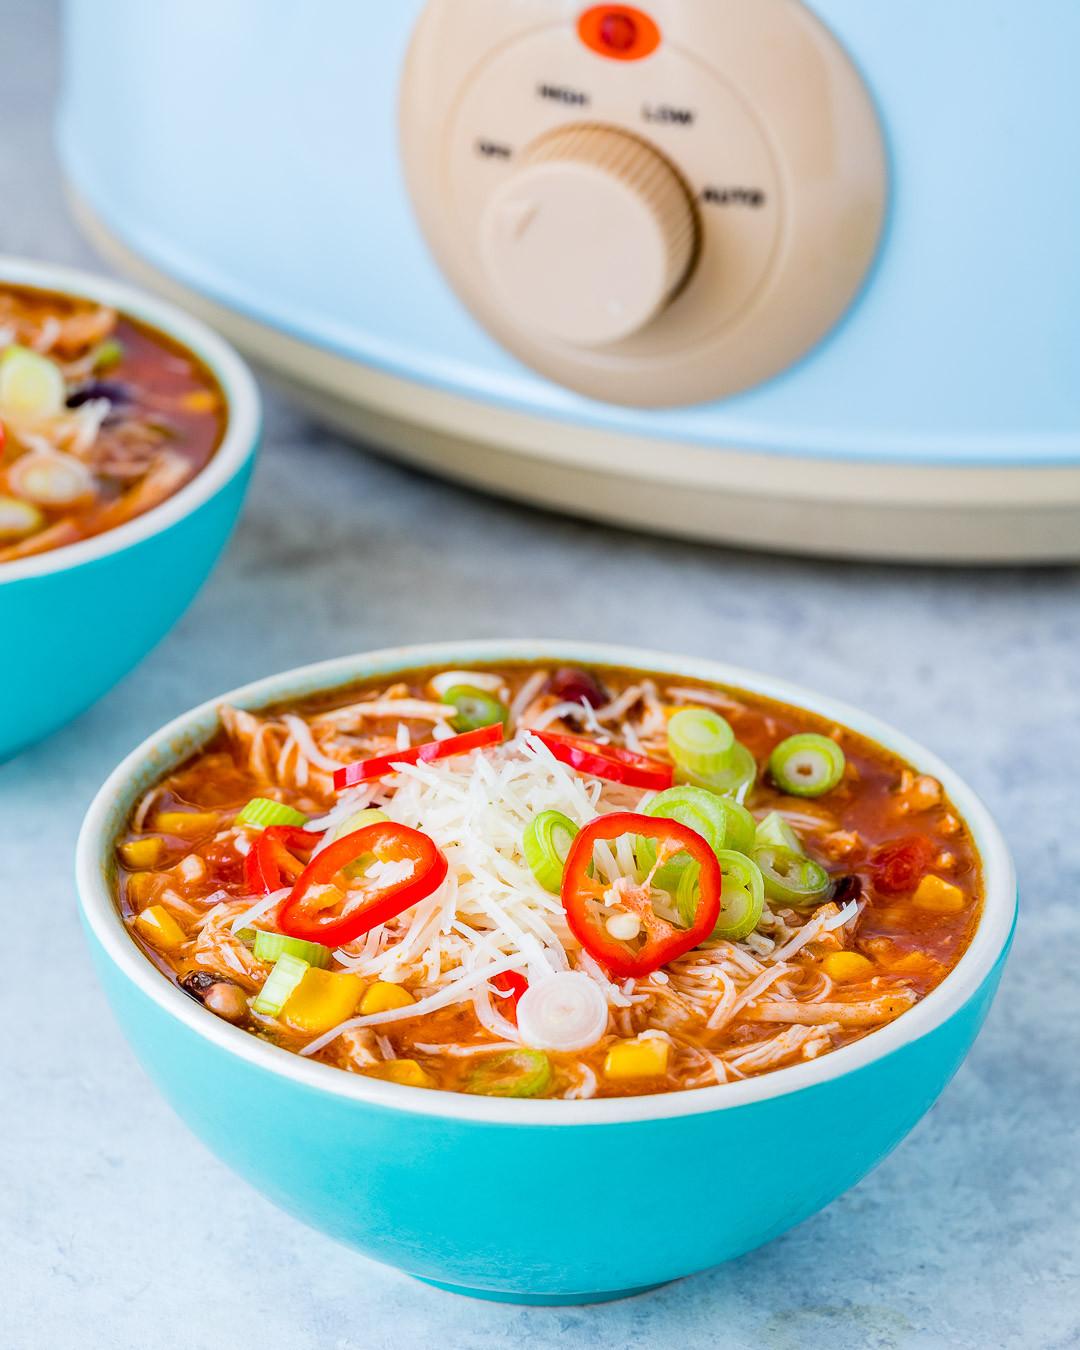 Healthy Chicken Enchilada Soup  Eat Clean Crockpot Chicken Enchilada Soup is Fast & Easy